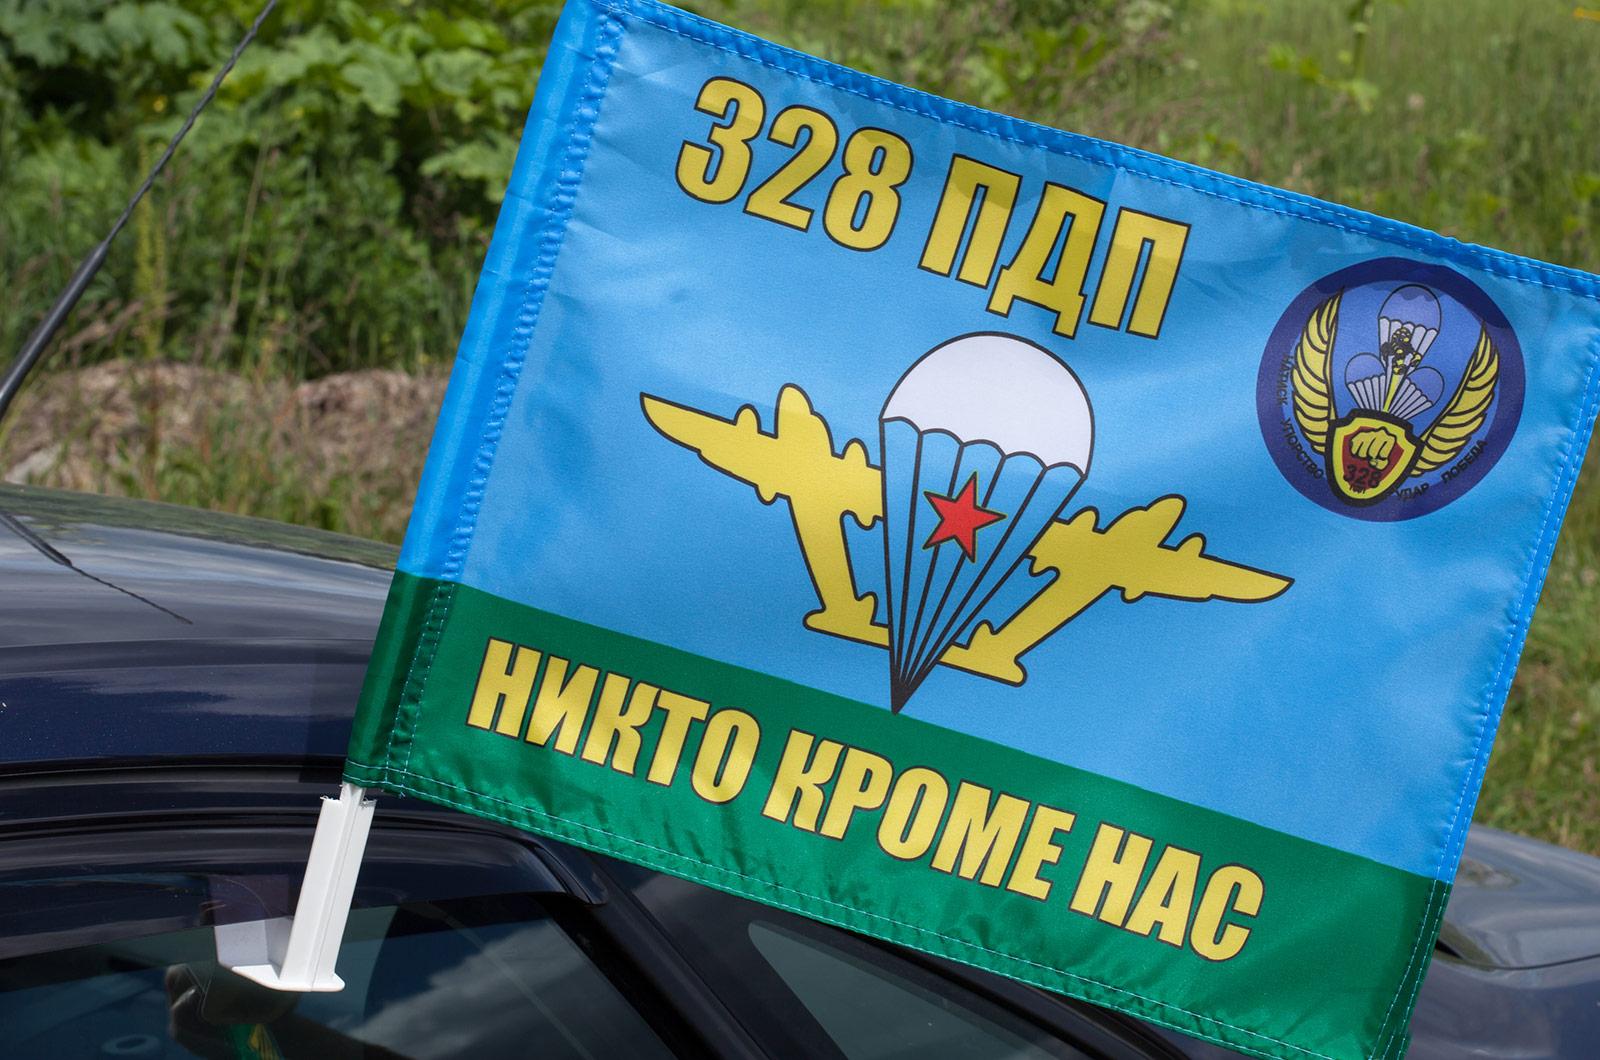 Флаг на машину с кронштейном 328 ПДП ВДВ